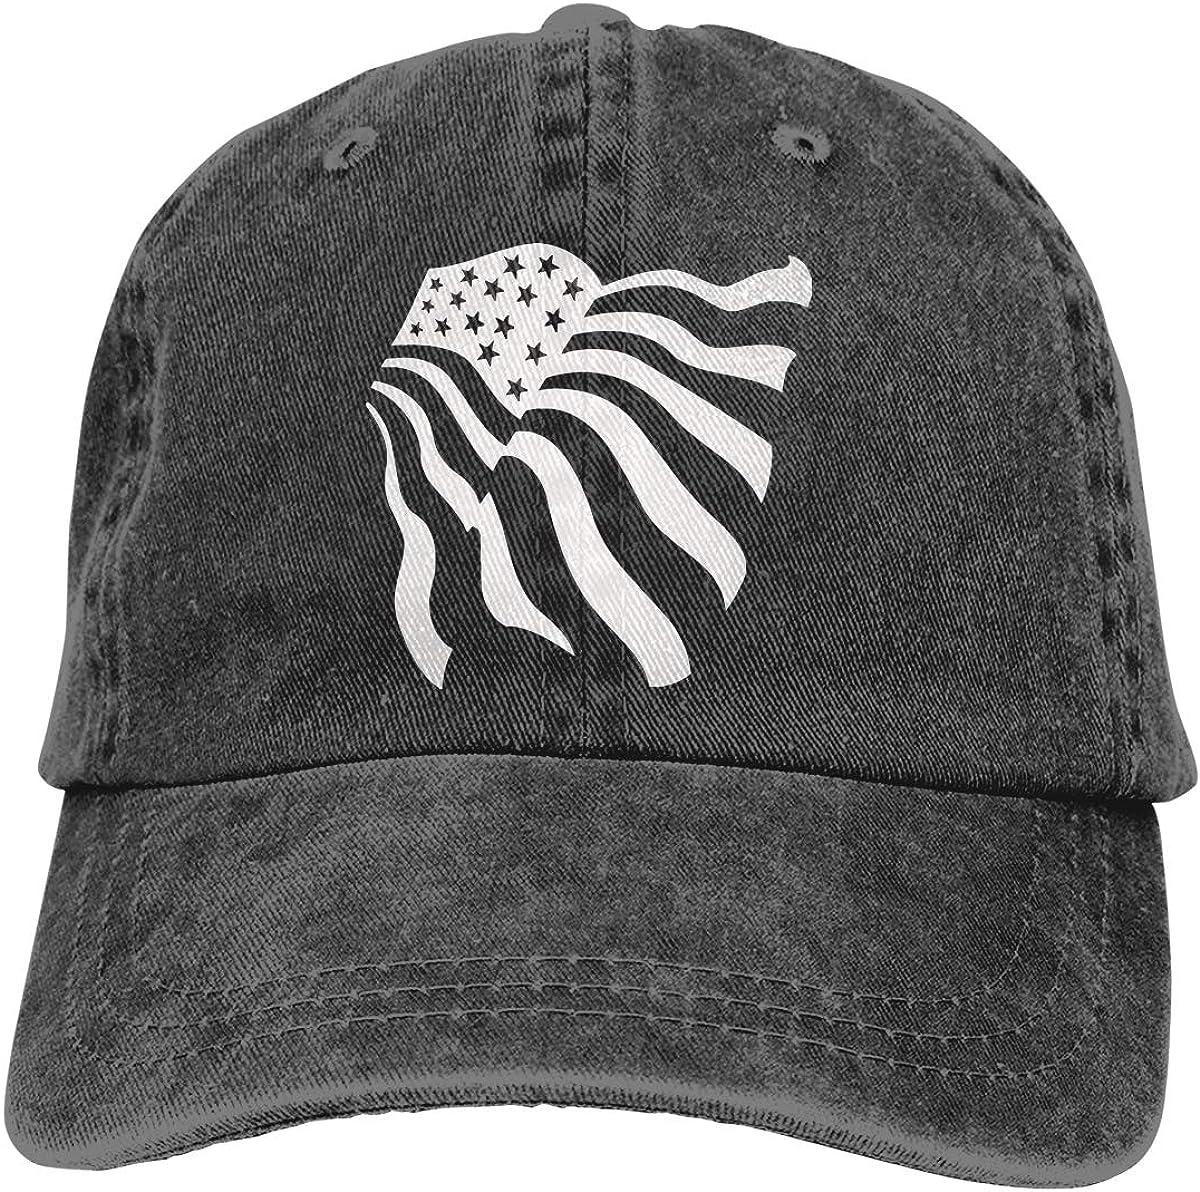 American Flag Denim Hat Adjustable Plain Cap Baseball Caps